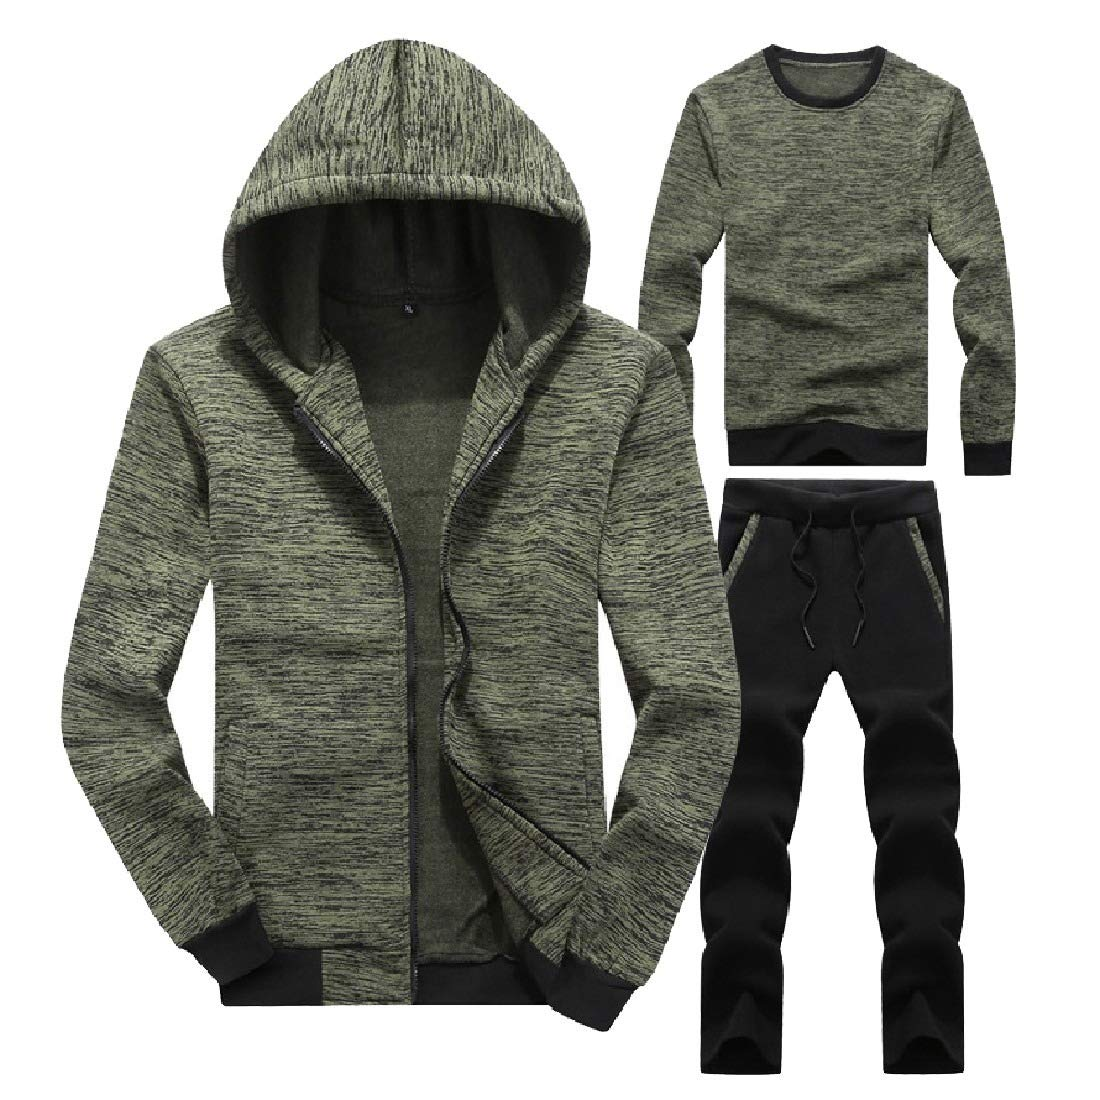 Comaba Mens Mid Waist Hooded Plus Size Zip Set 3-Piece Lounge Sweatsuit Set